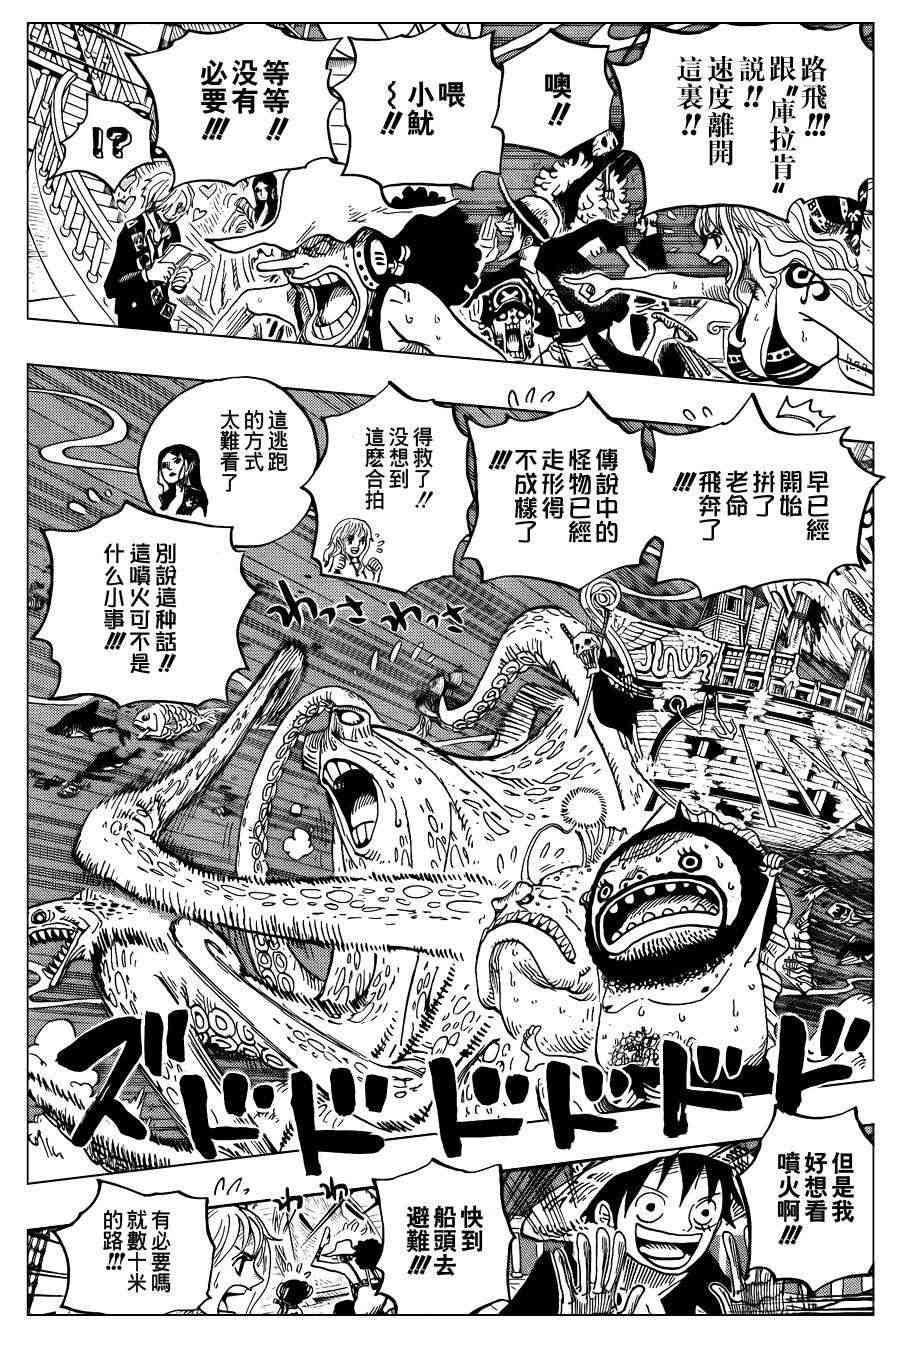 One Piece Manga 607 Spoiler Pics 0314